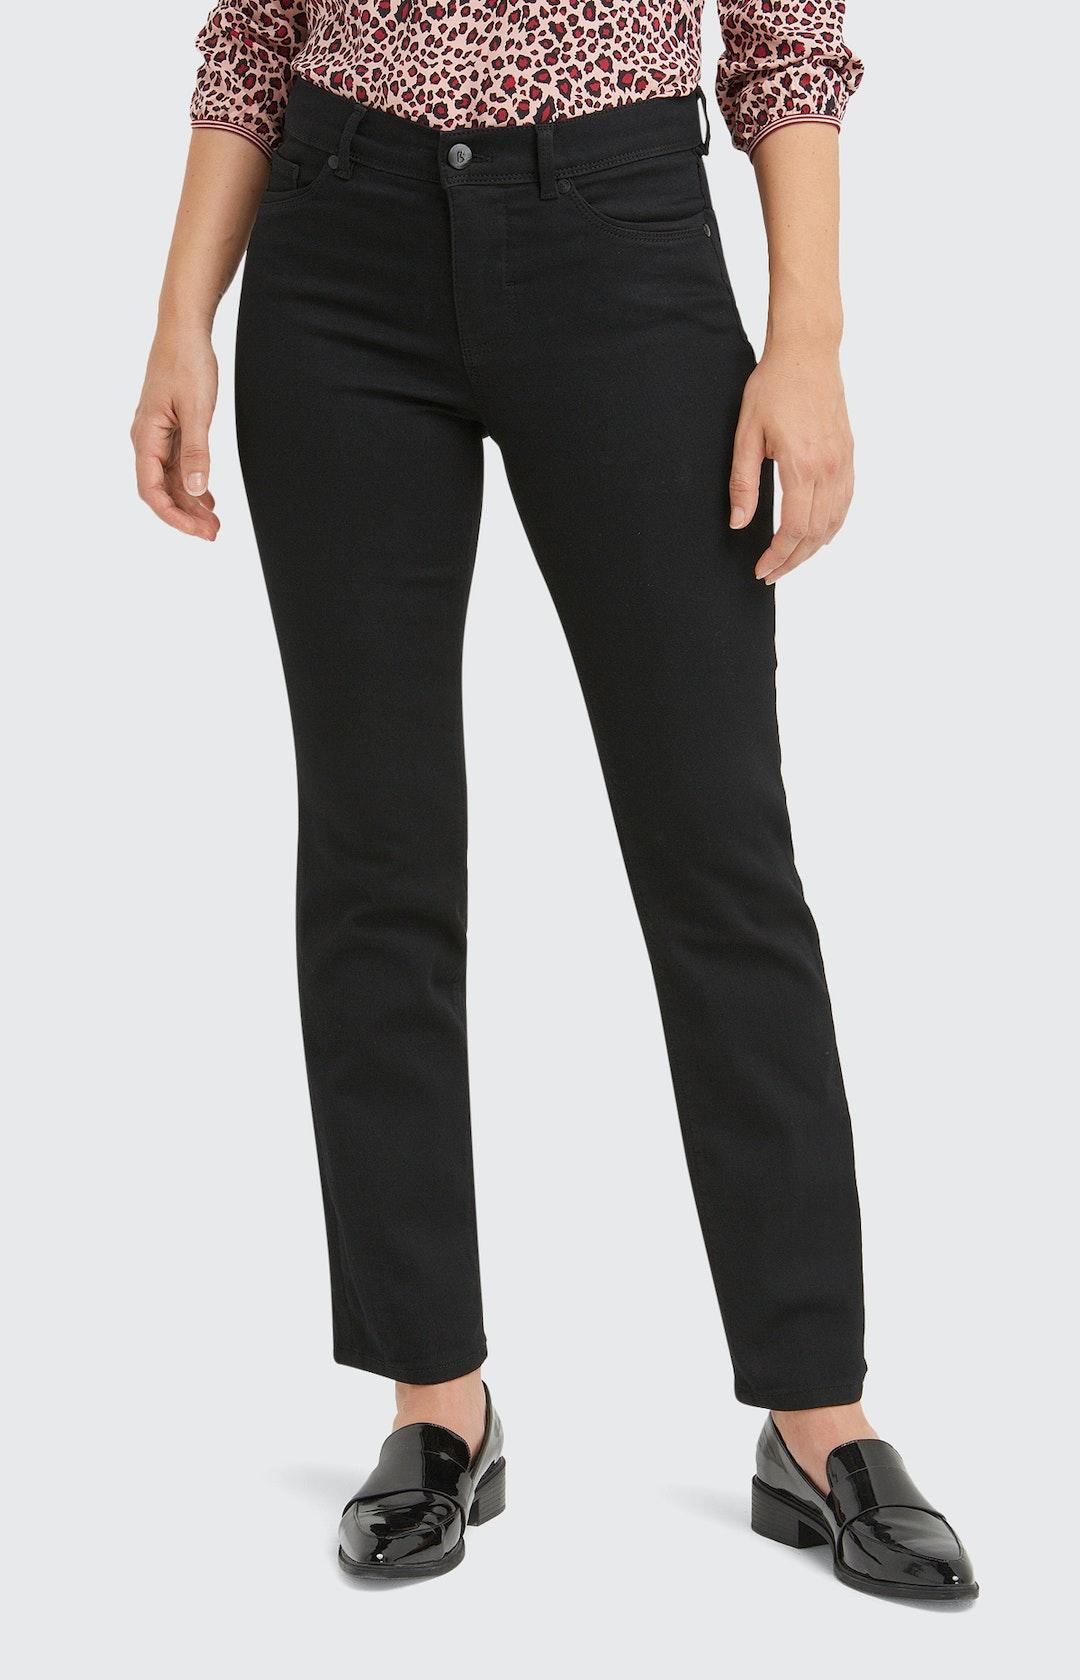 Jeans Doro schwarz 30inch